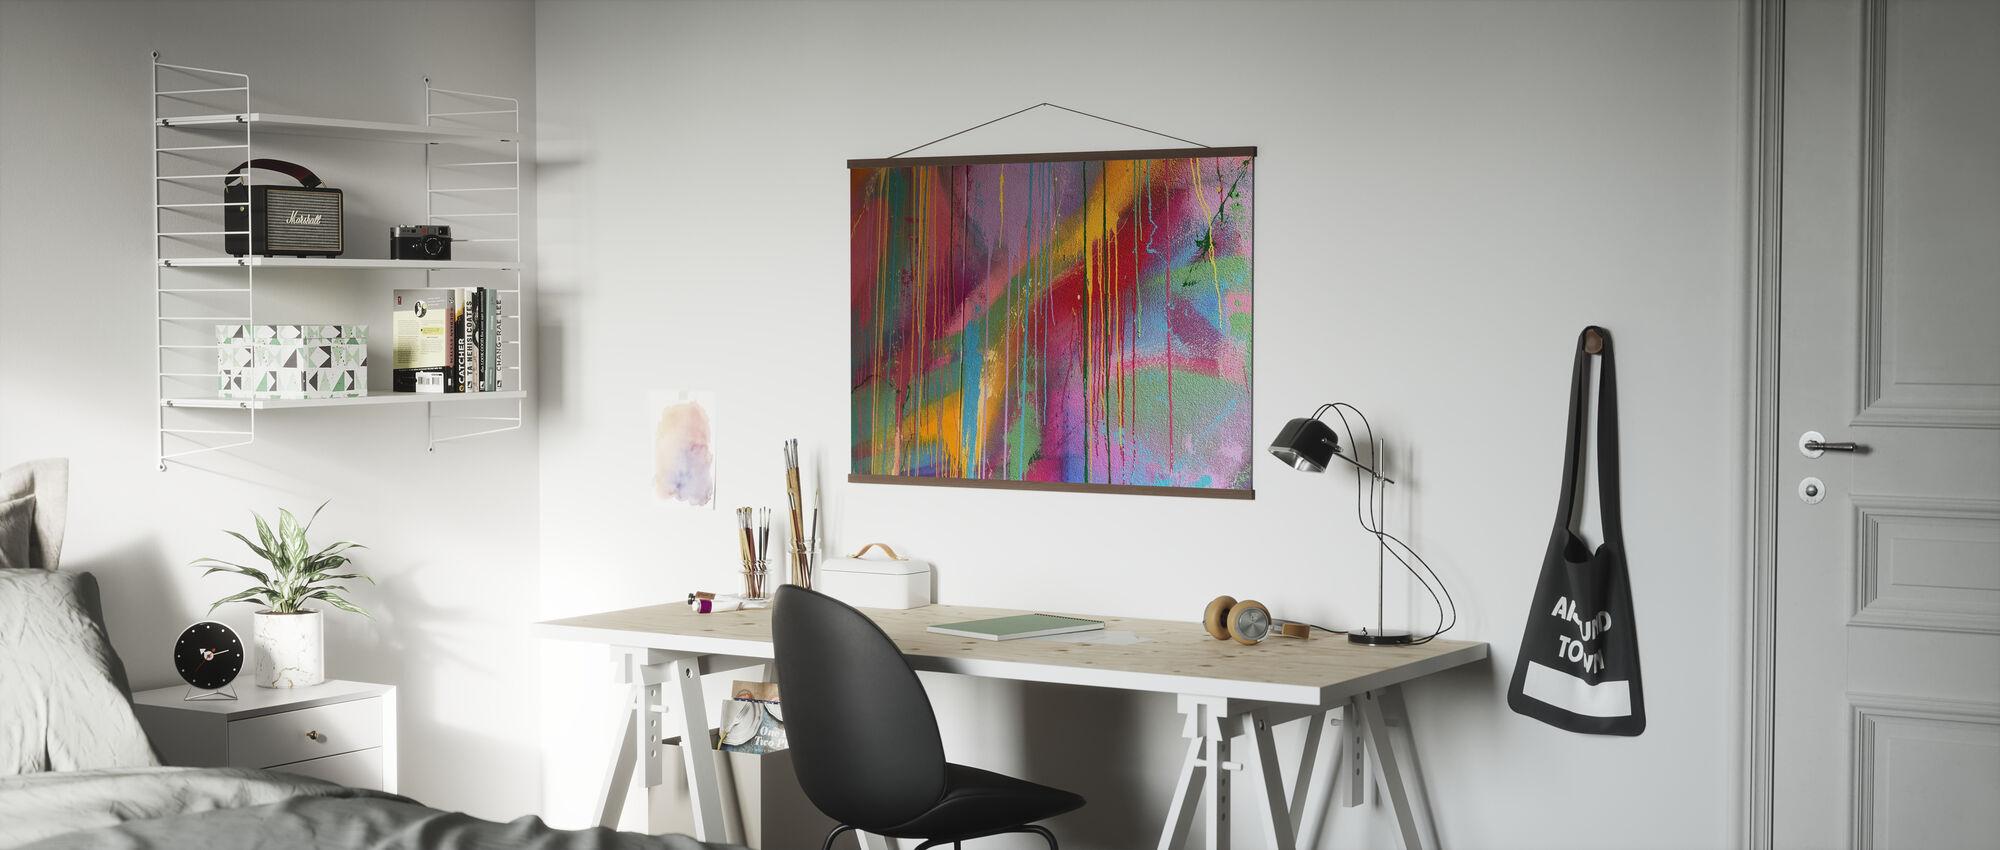 Colorful Wall Graffiti - Poster - Office